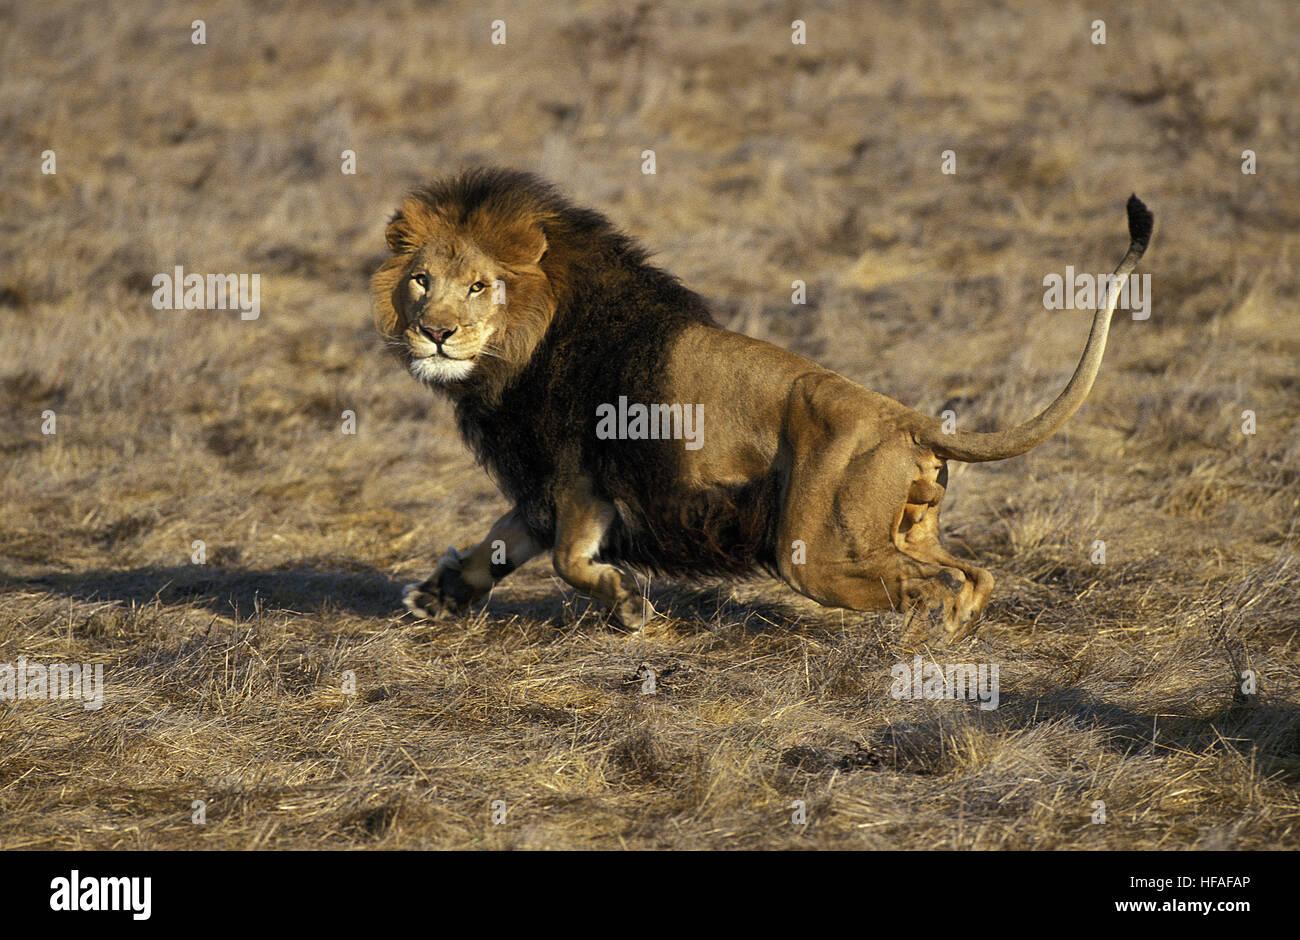 African lions running